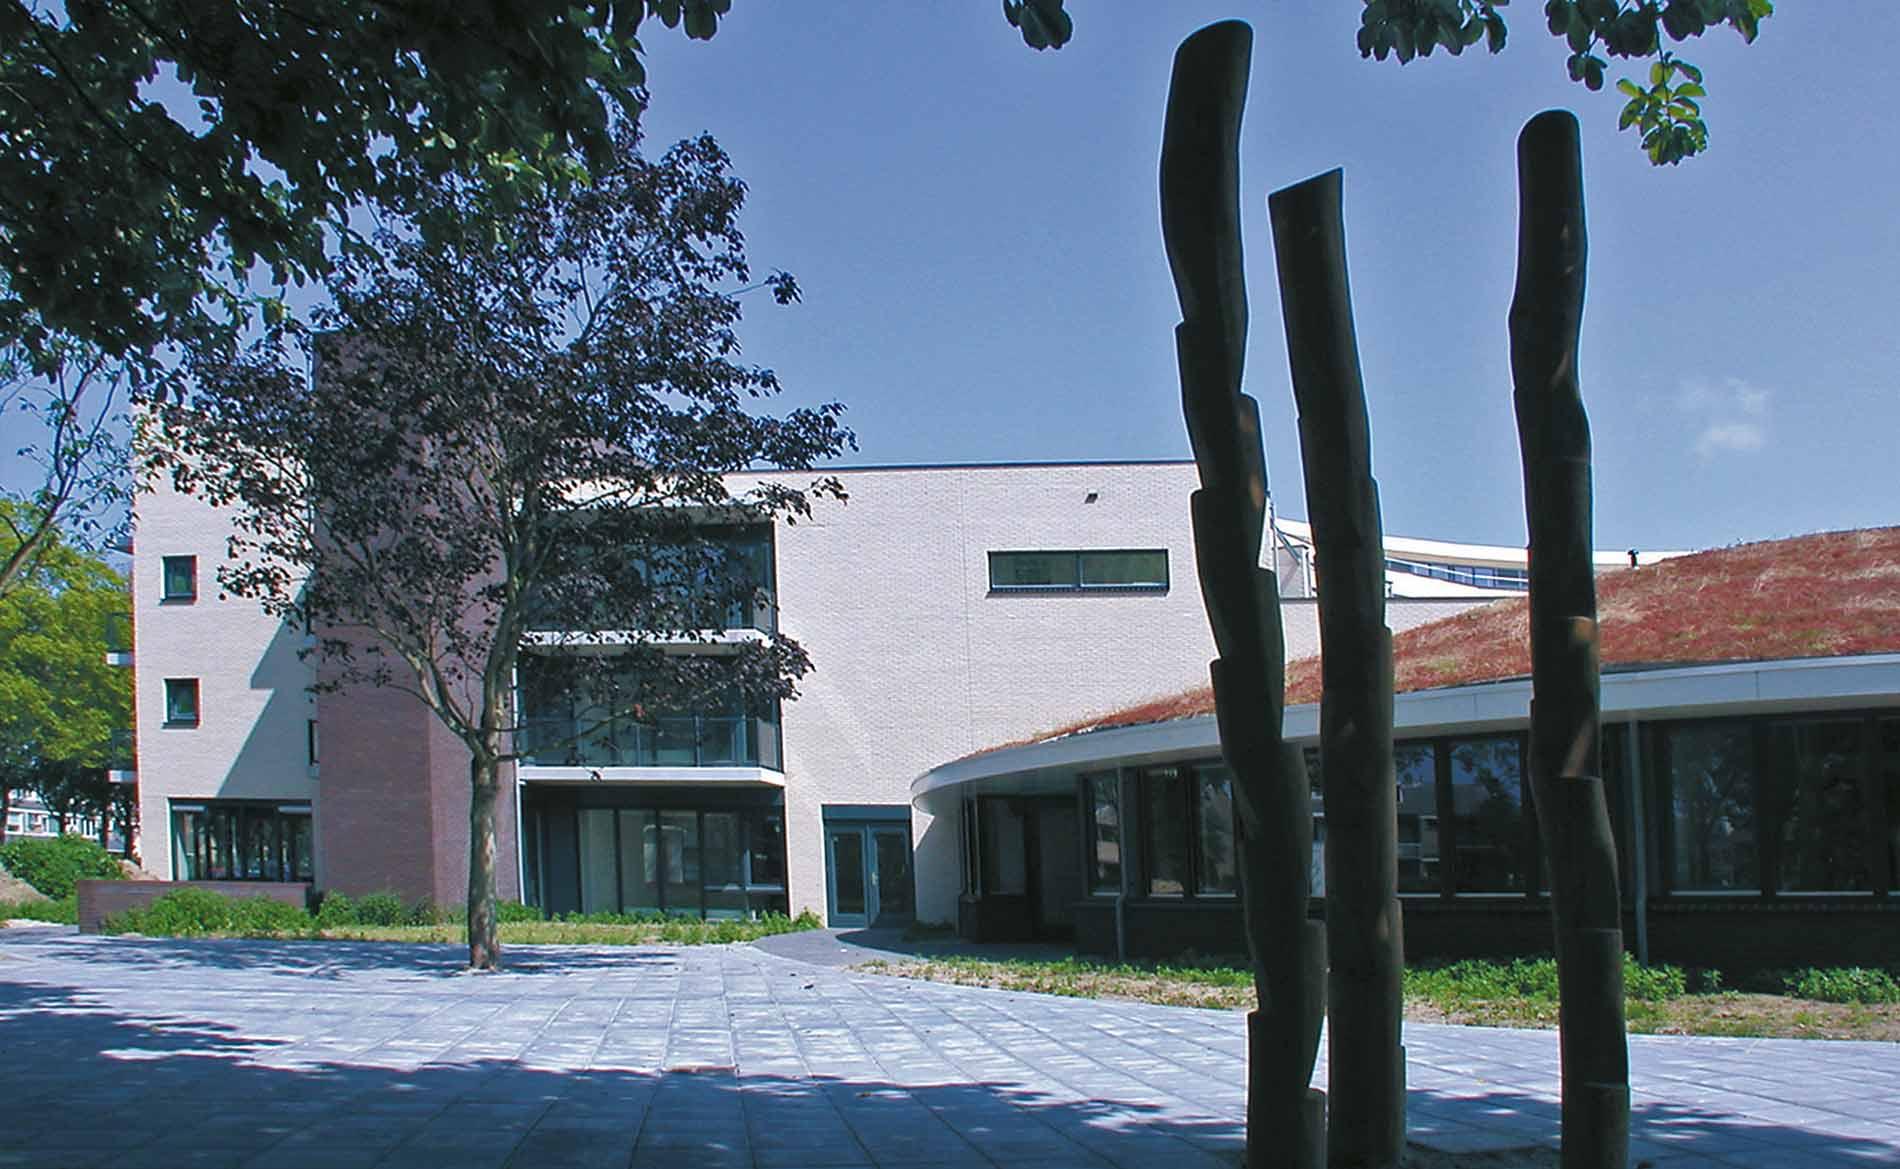 architect duurzaam bouwen duurzame school Frisse Scholen Energie 0 Energie nul basisschool Sokkerwei Castricum BBHD architecten